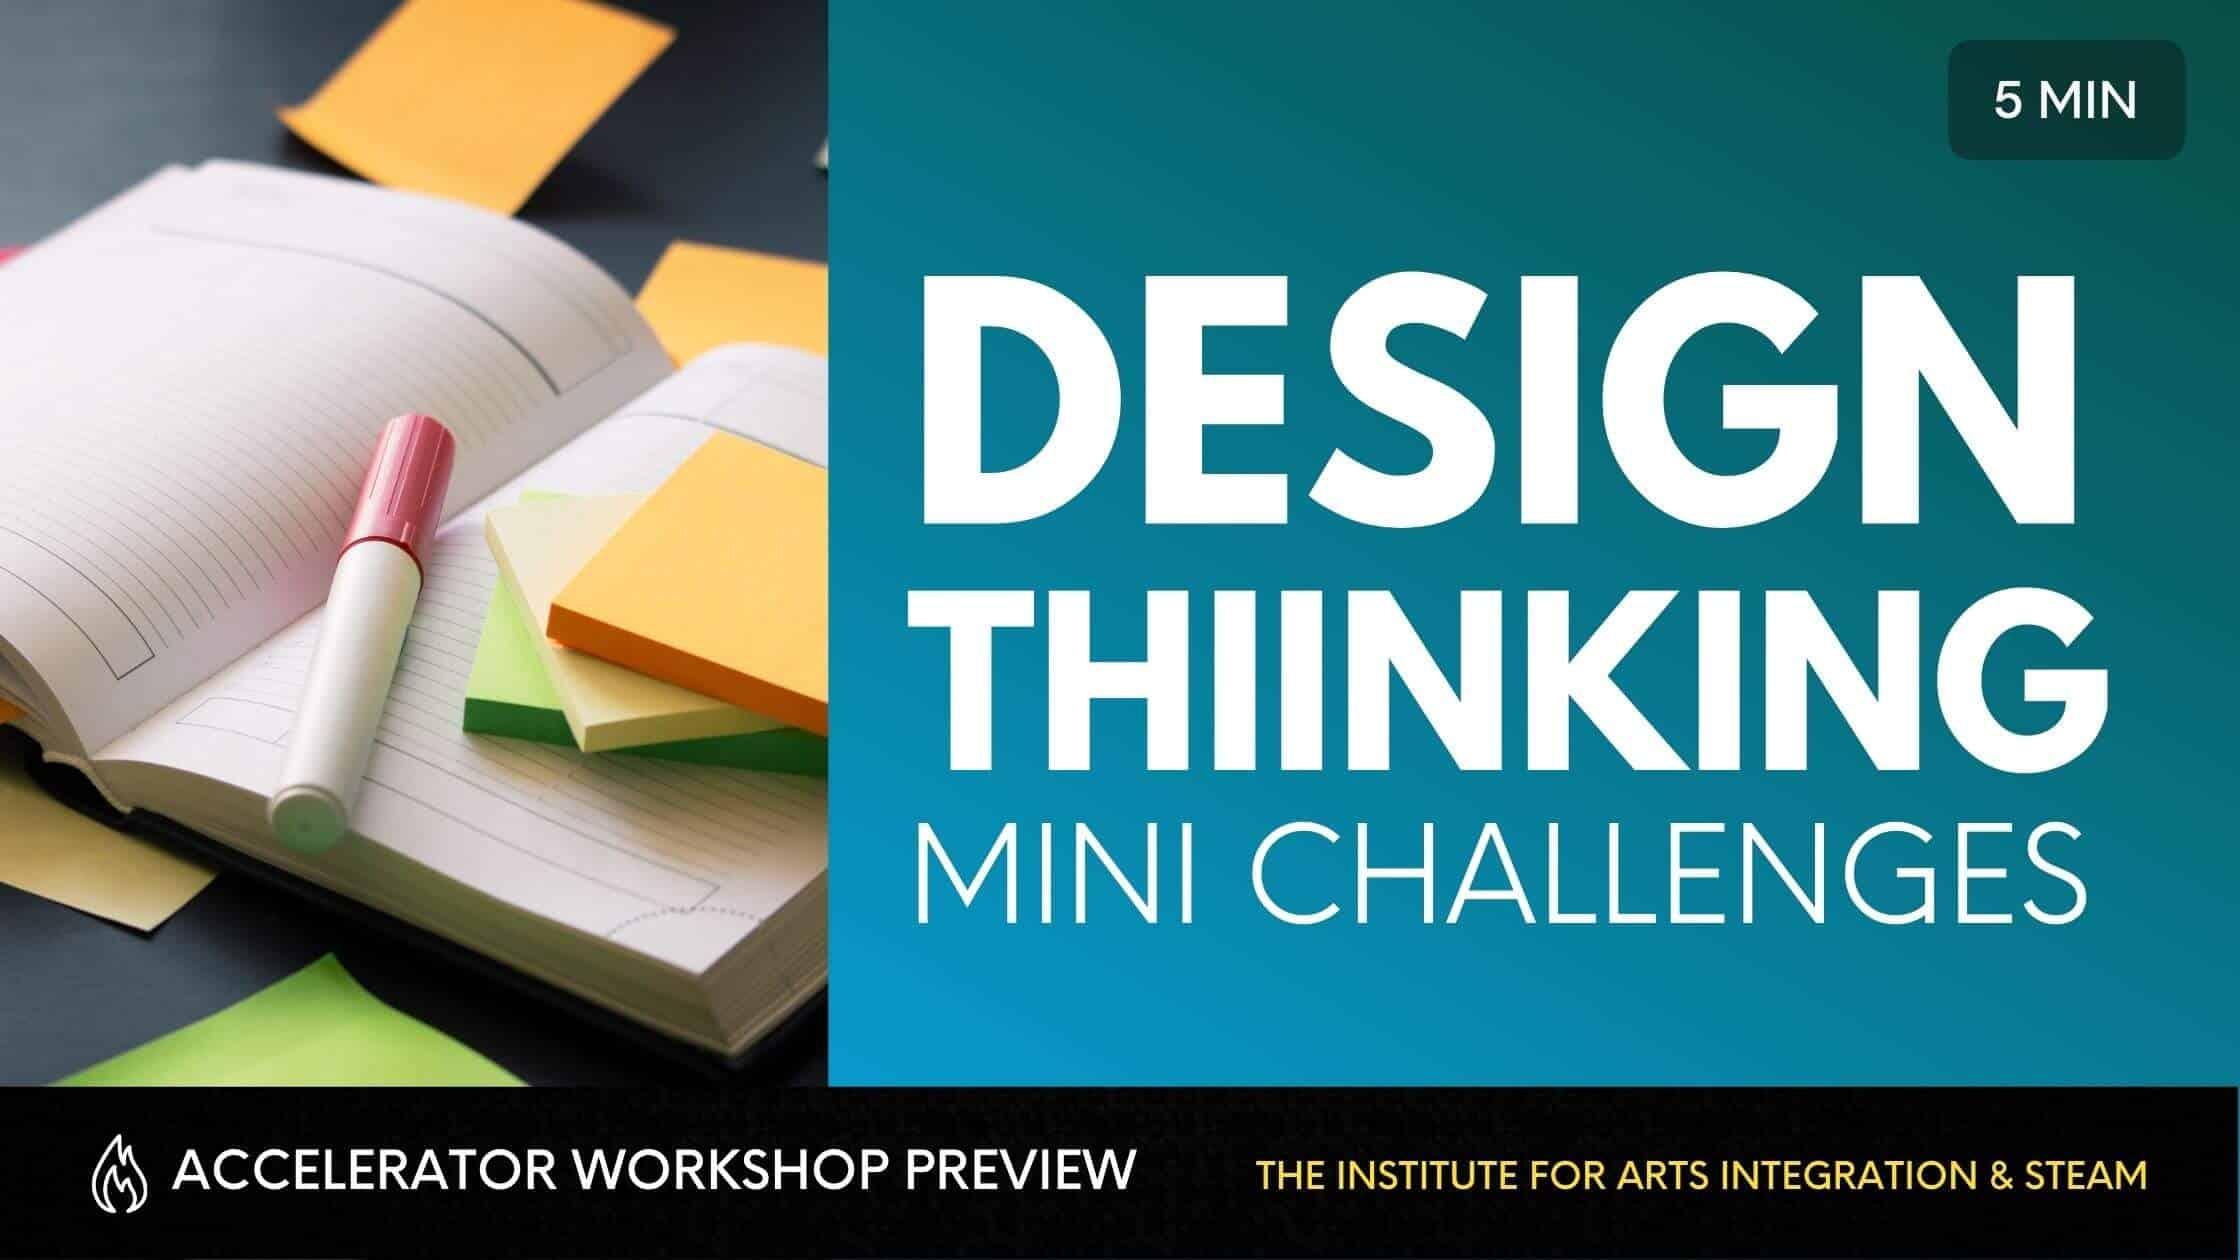 DESIGN THINKING MINI CHALLENGES